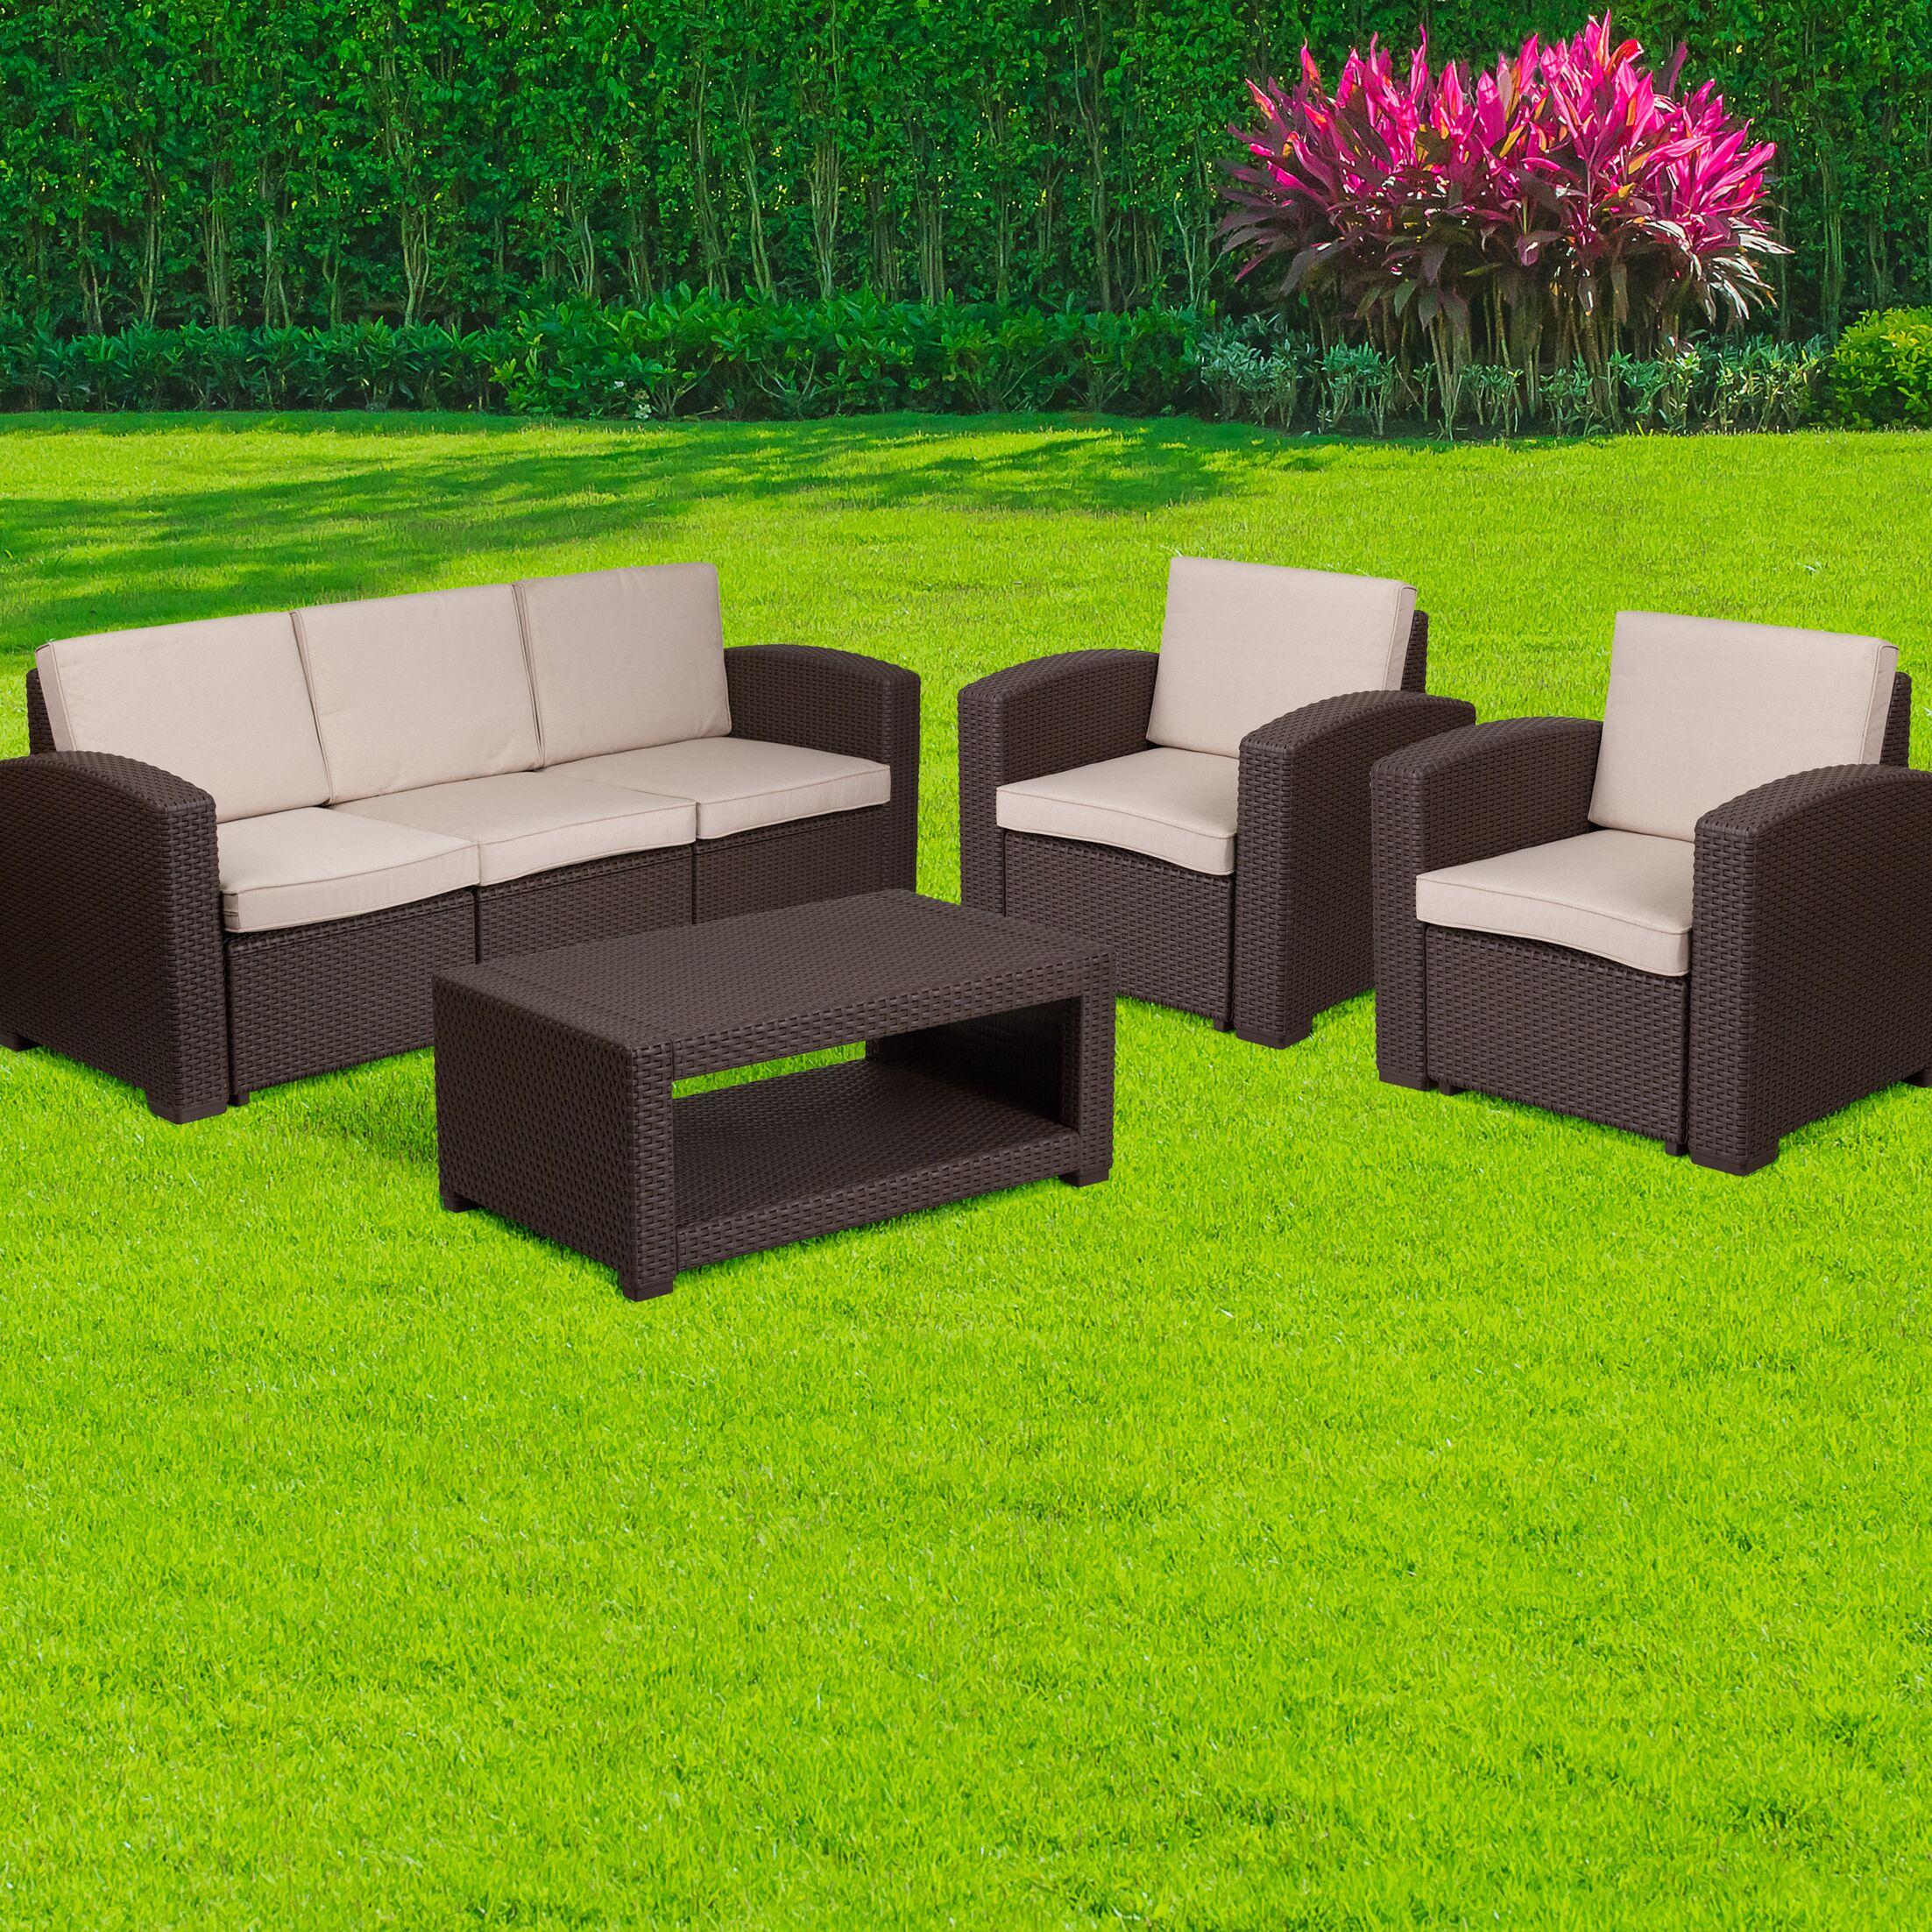 Resendiz 4 Piece Rattan Sofa Set with Cushions